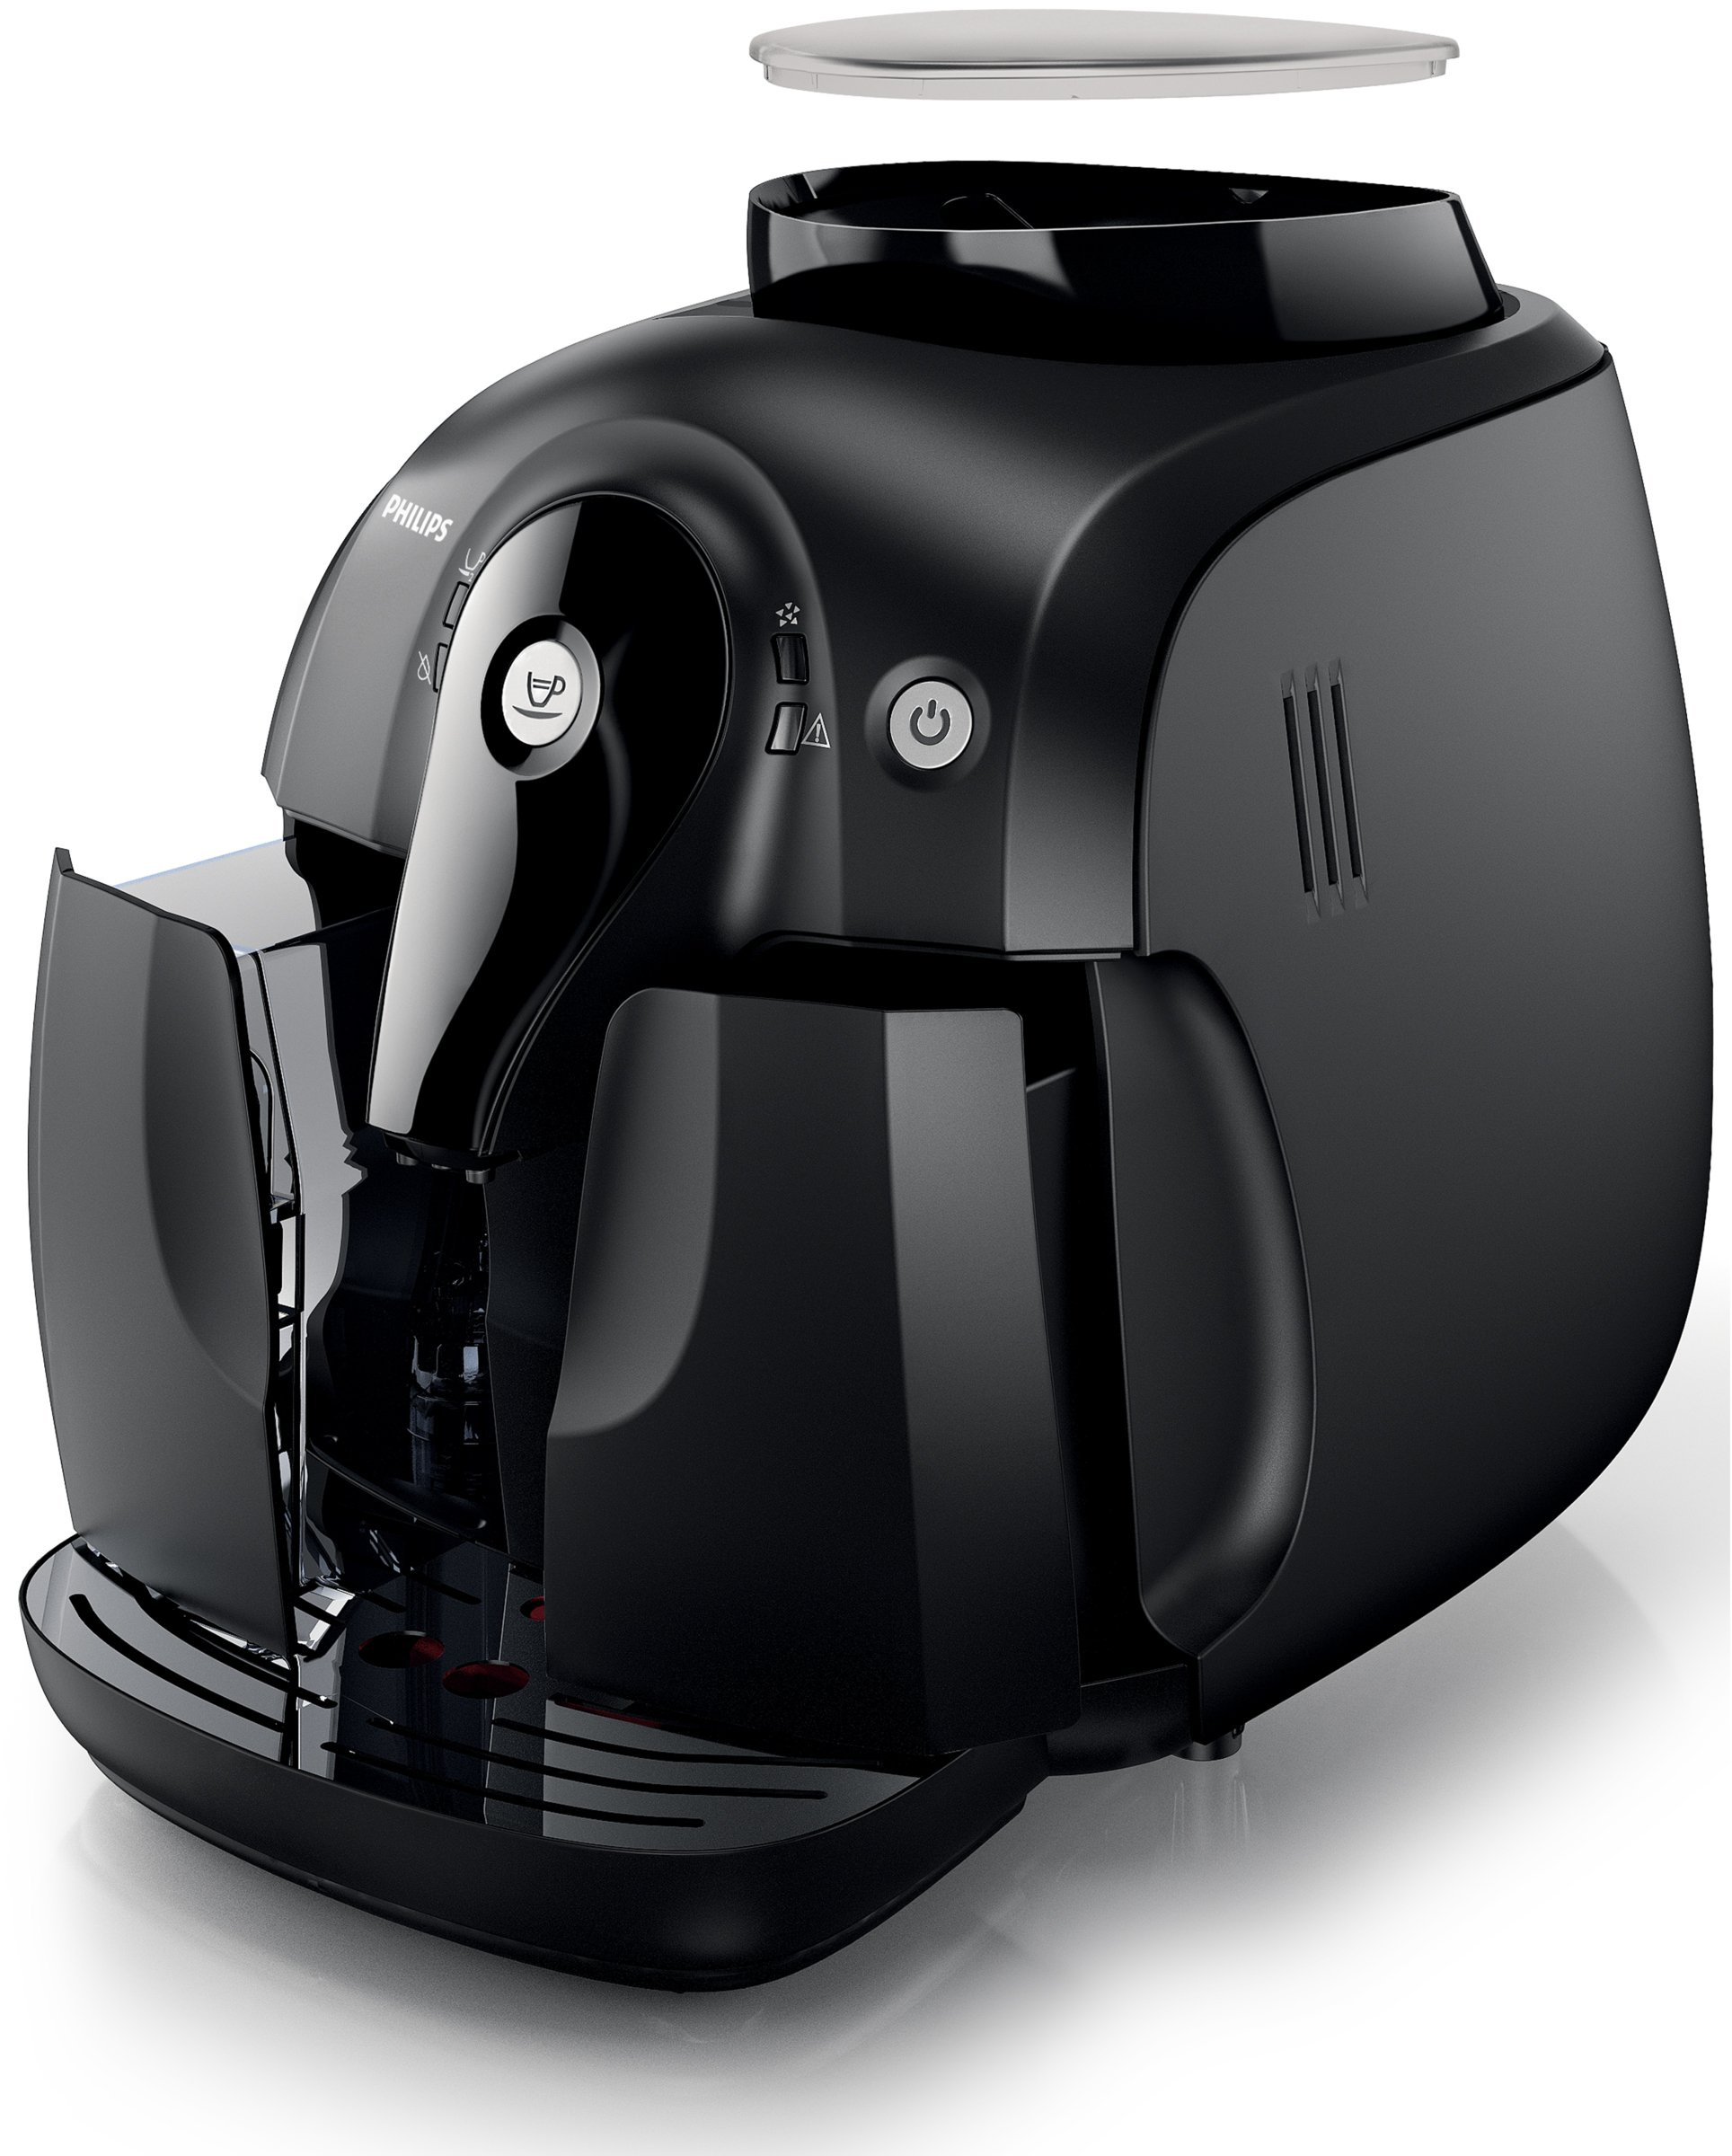 Philips-HD865001-2000-Serie-Kaffeevollautomat-Keramikmahlwerk-schwarz